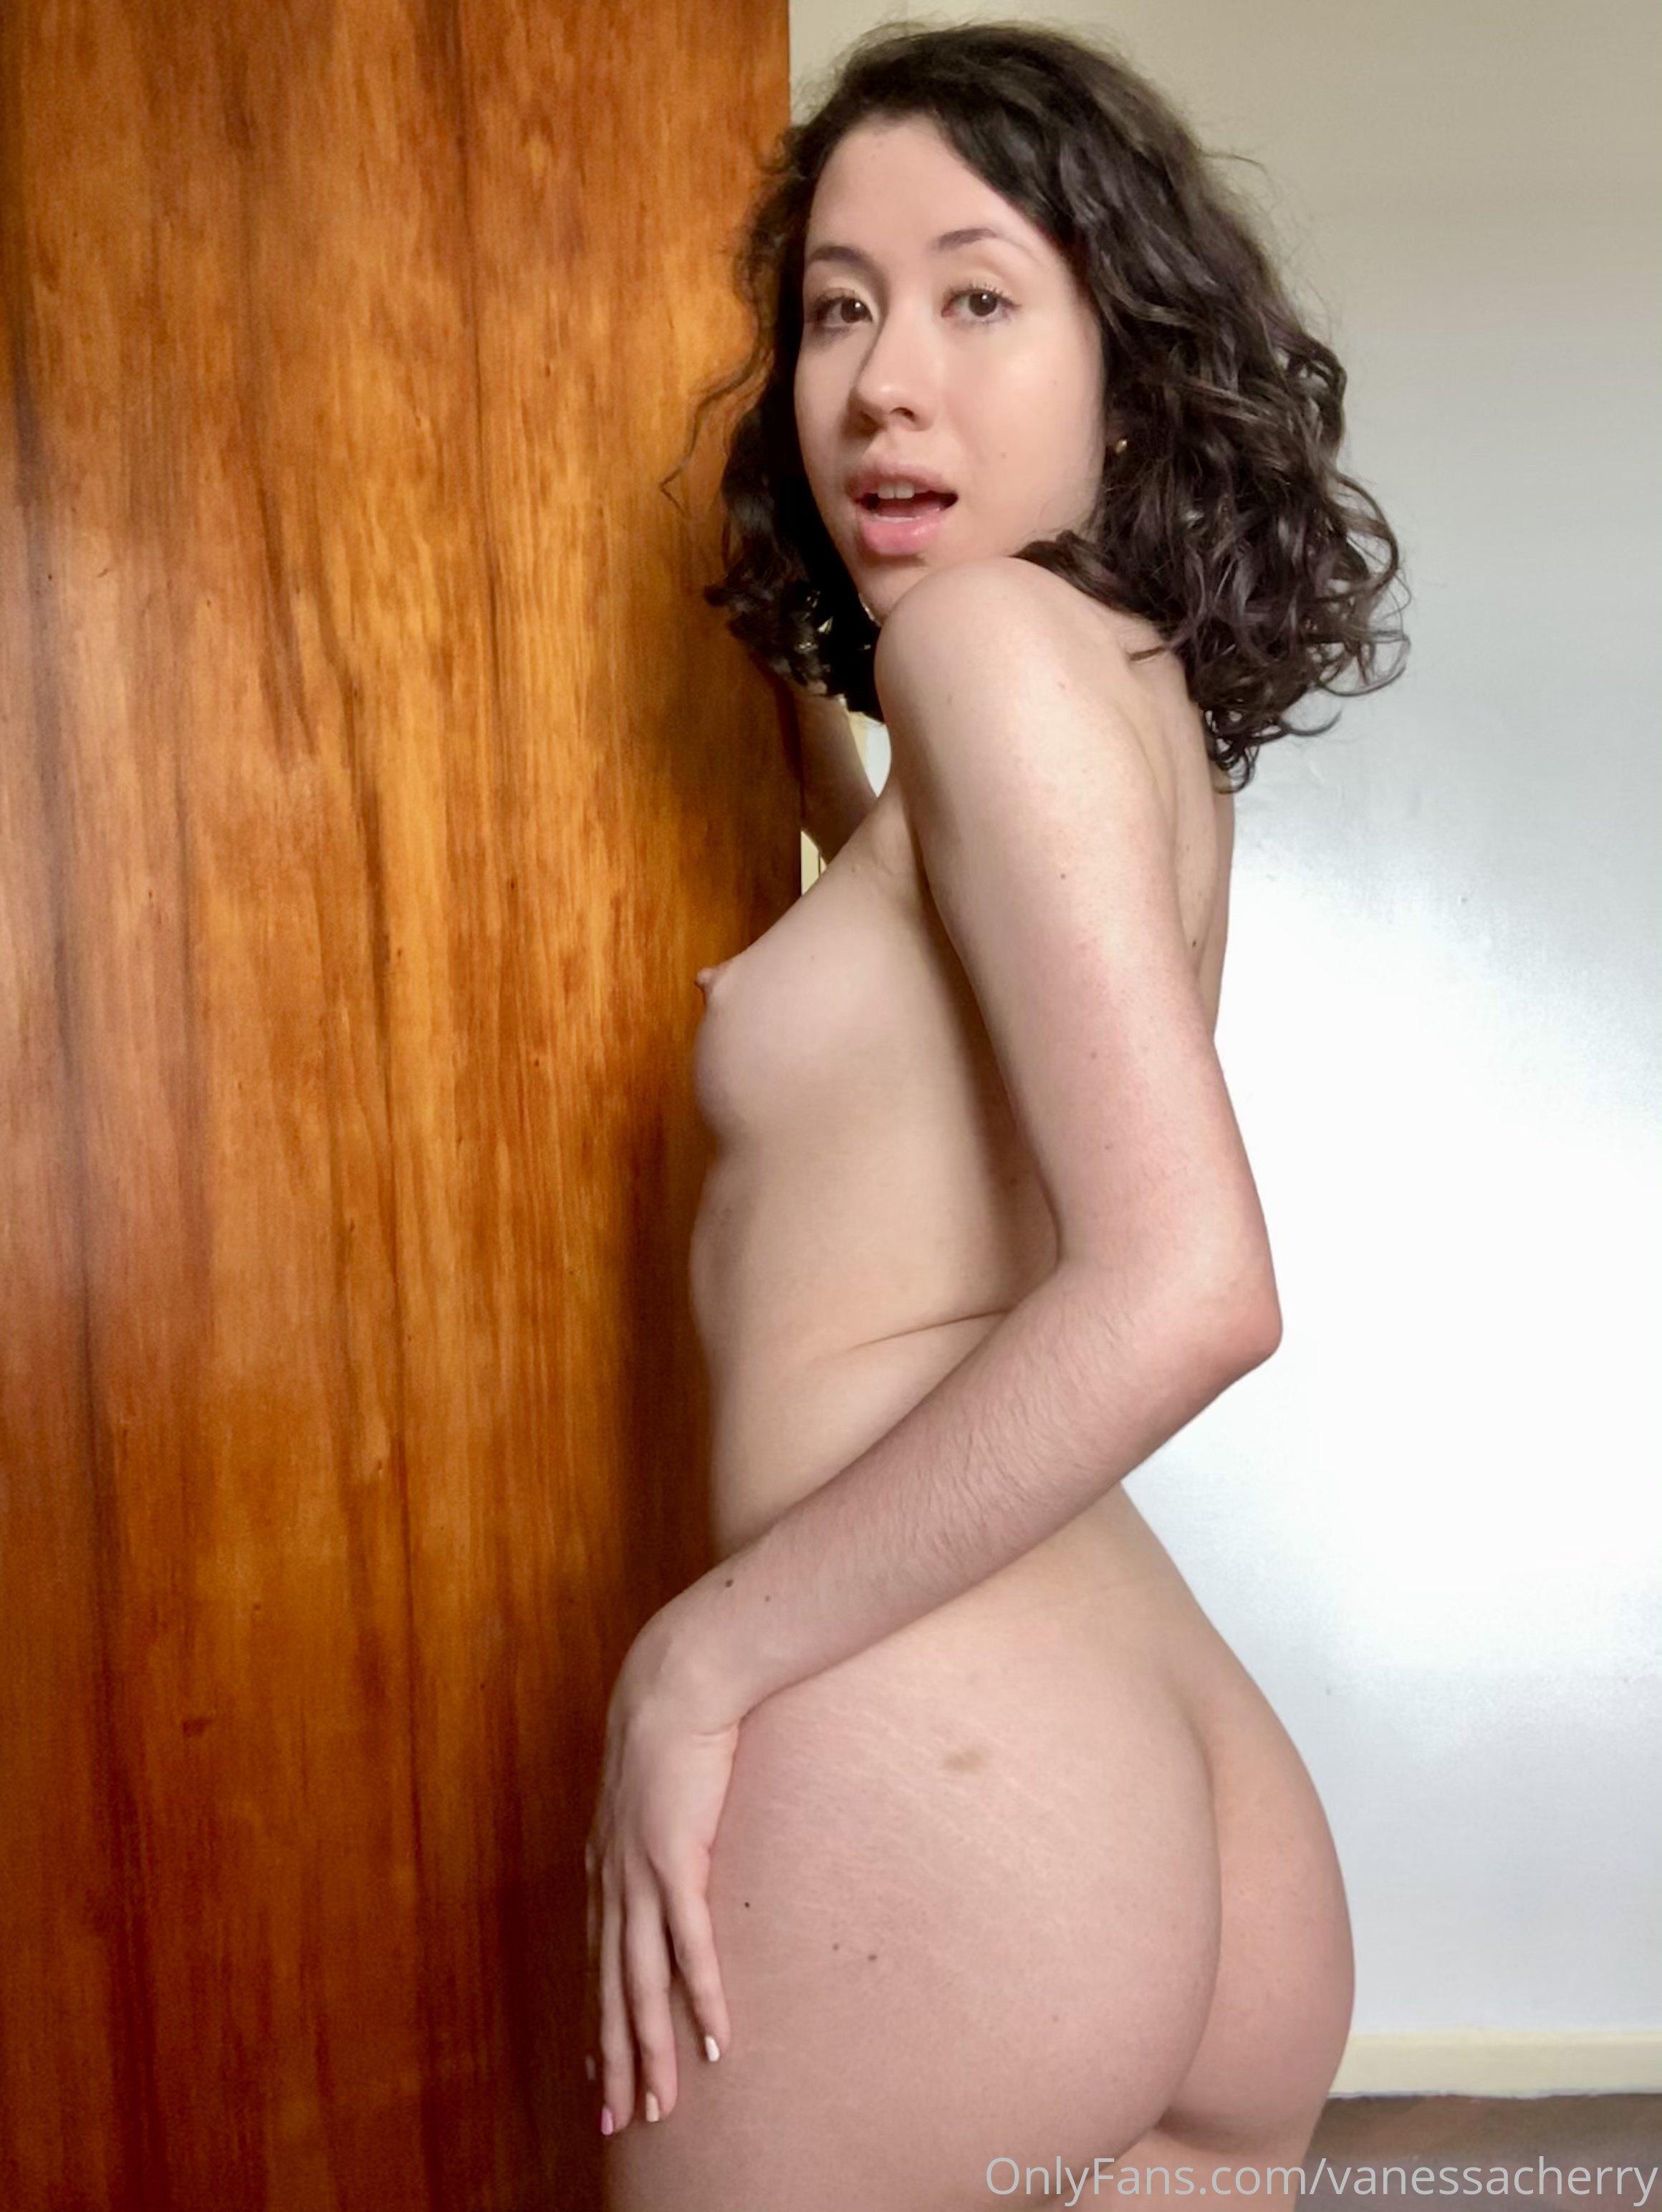 Vanessacherry 0075